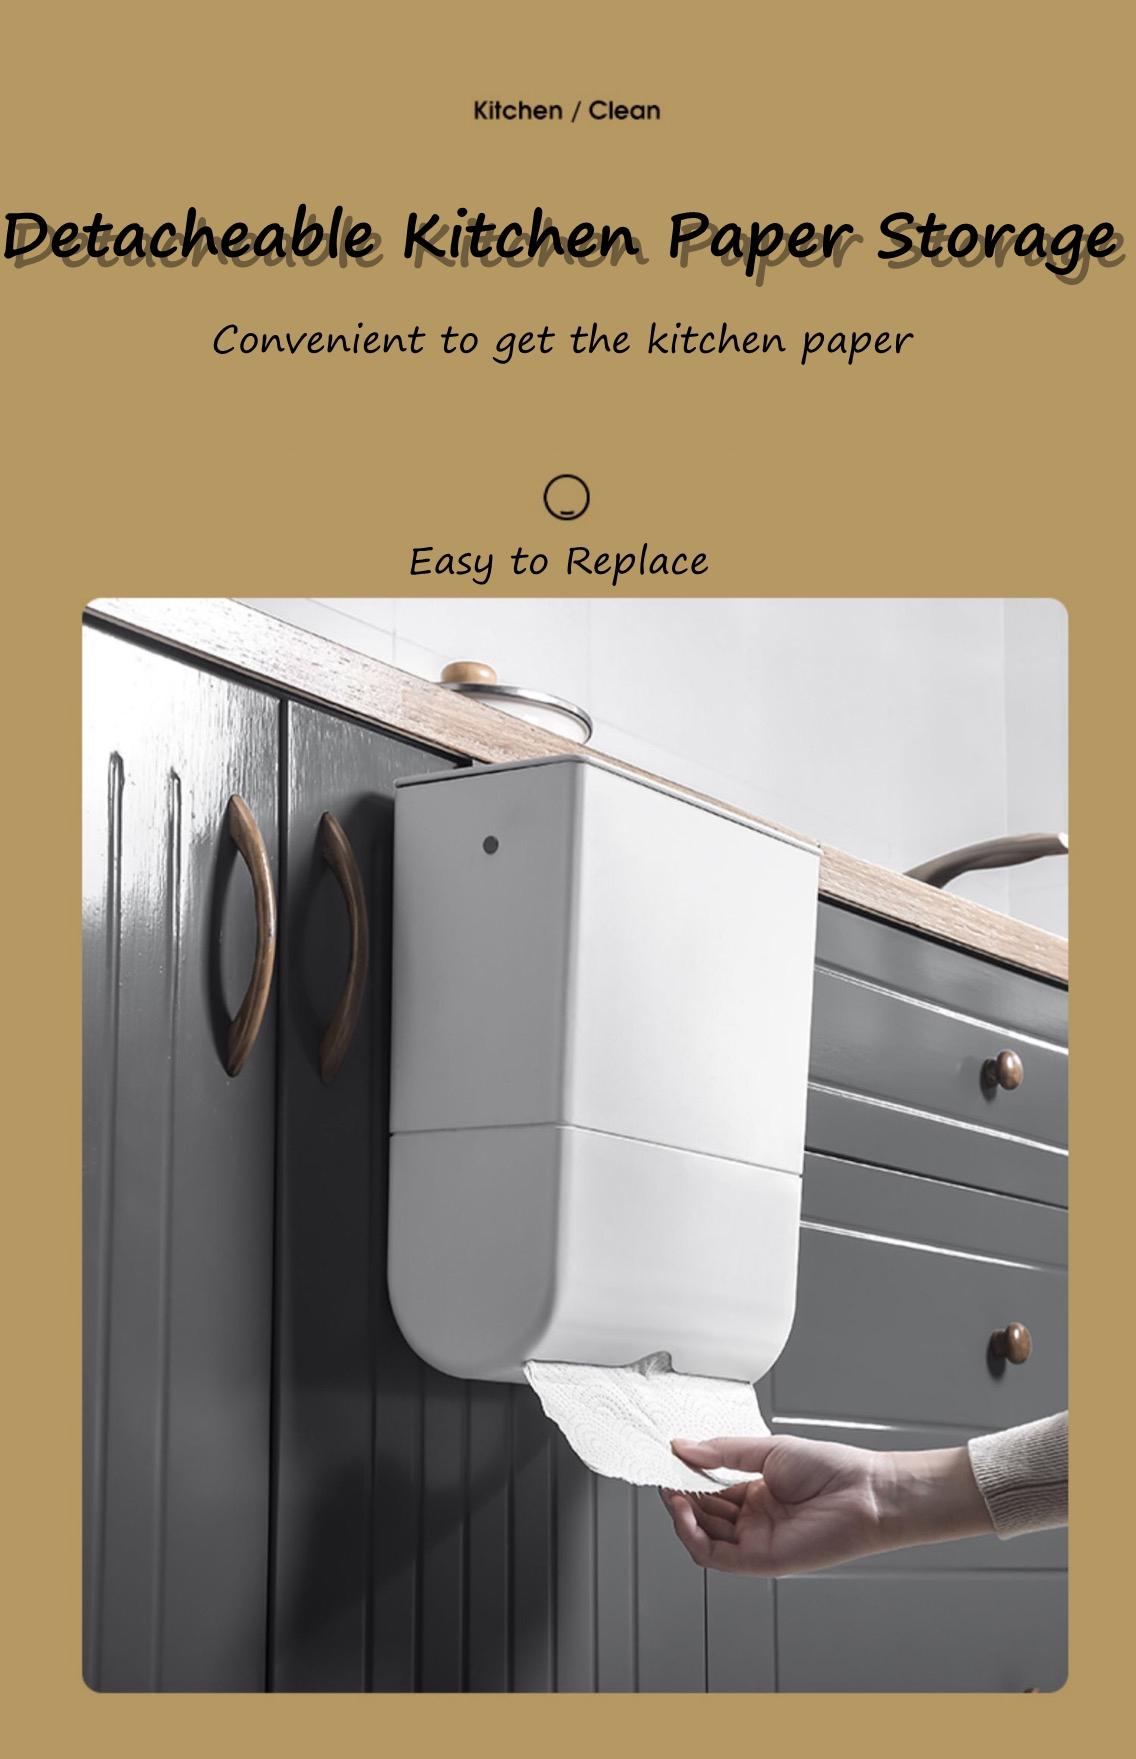 Trash Bin with kicthen paper storage